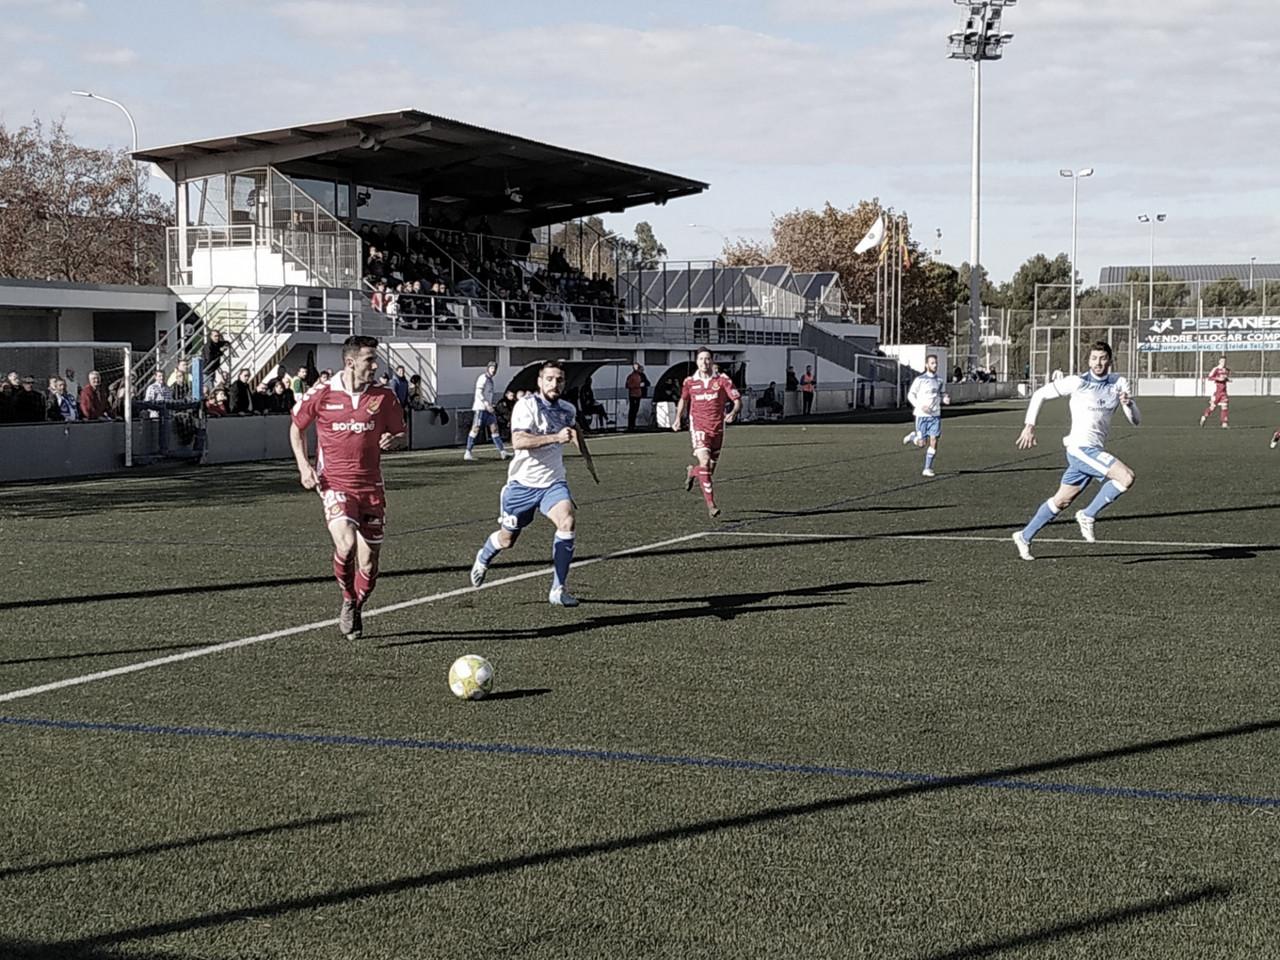 AE Prat - Nàstic de Tarragona (1-3): Victoria sufrida en el Sagnier